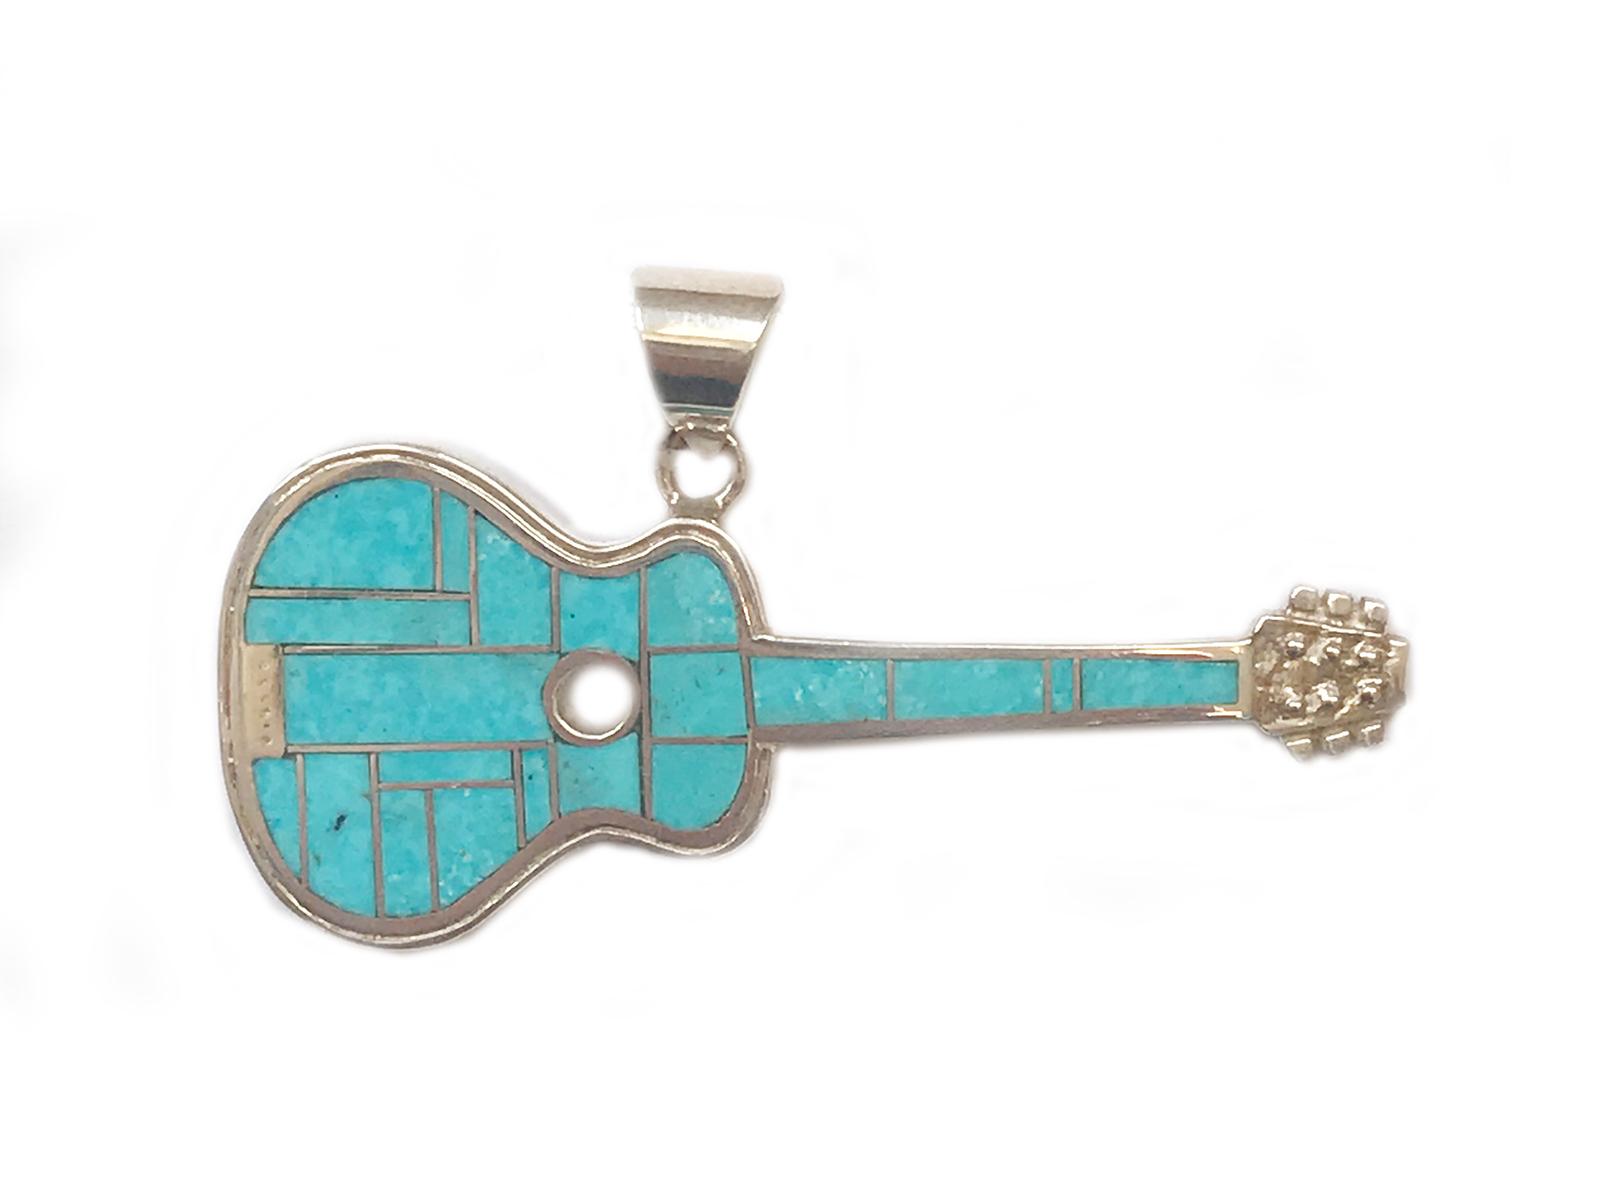 Kingman Turquoise Inlay Guitar Pendant